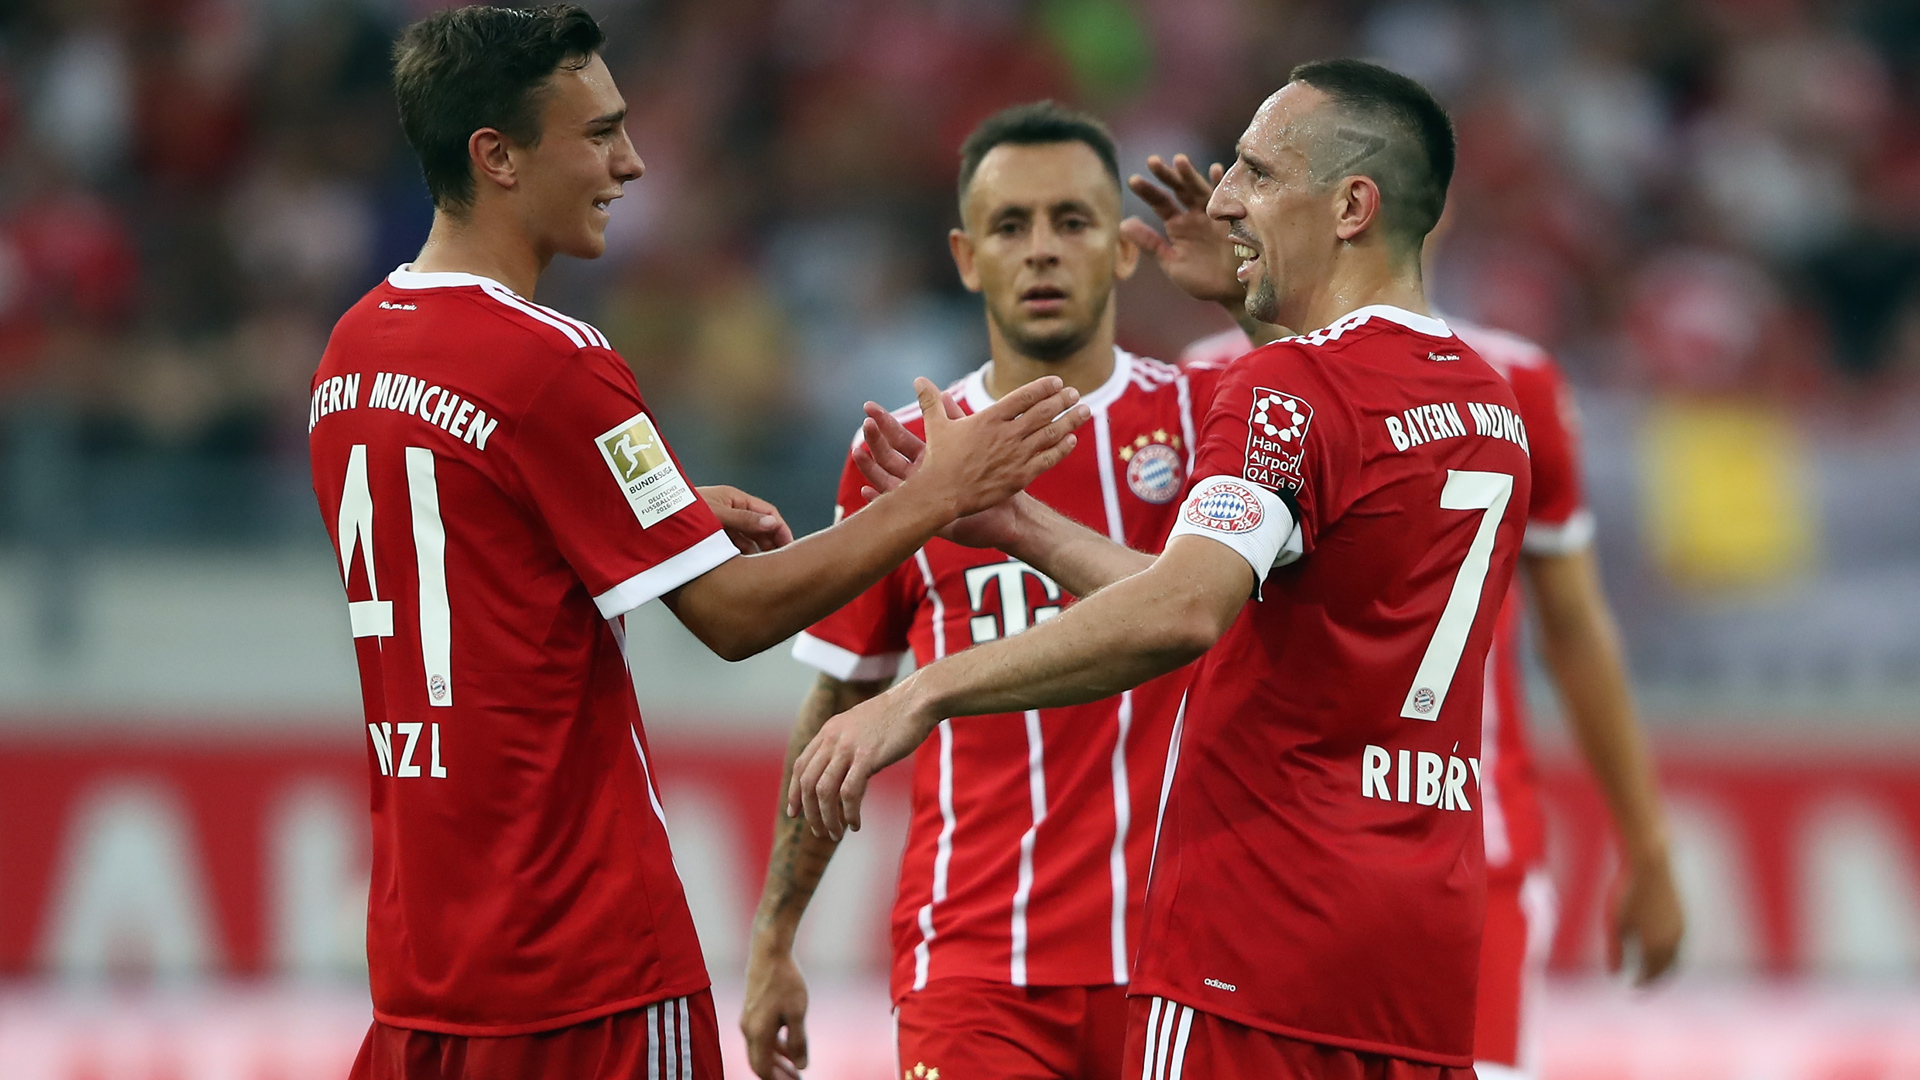 Bayern - Kickers Offenbach, Ribery, Nitzel, Rafinha, Retterspiel, 08302017